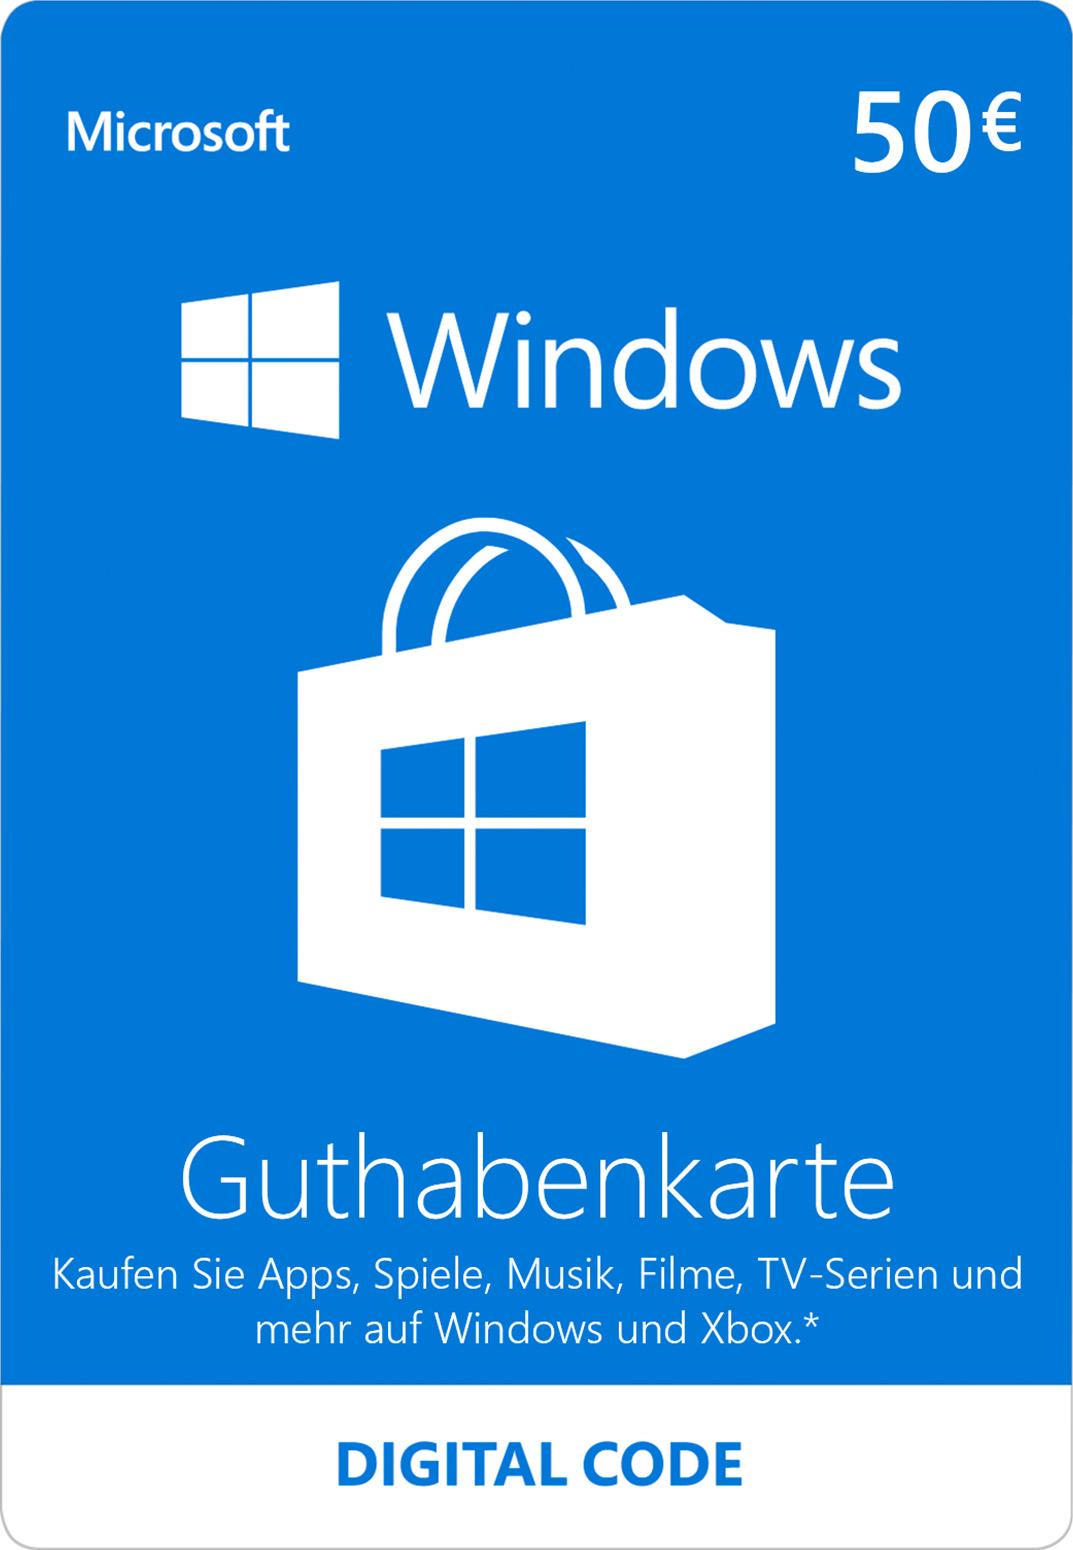 Windows Store digitale Geschenkkarte: 50,00 €